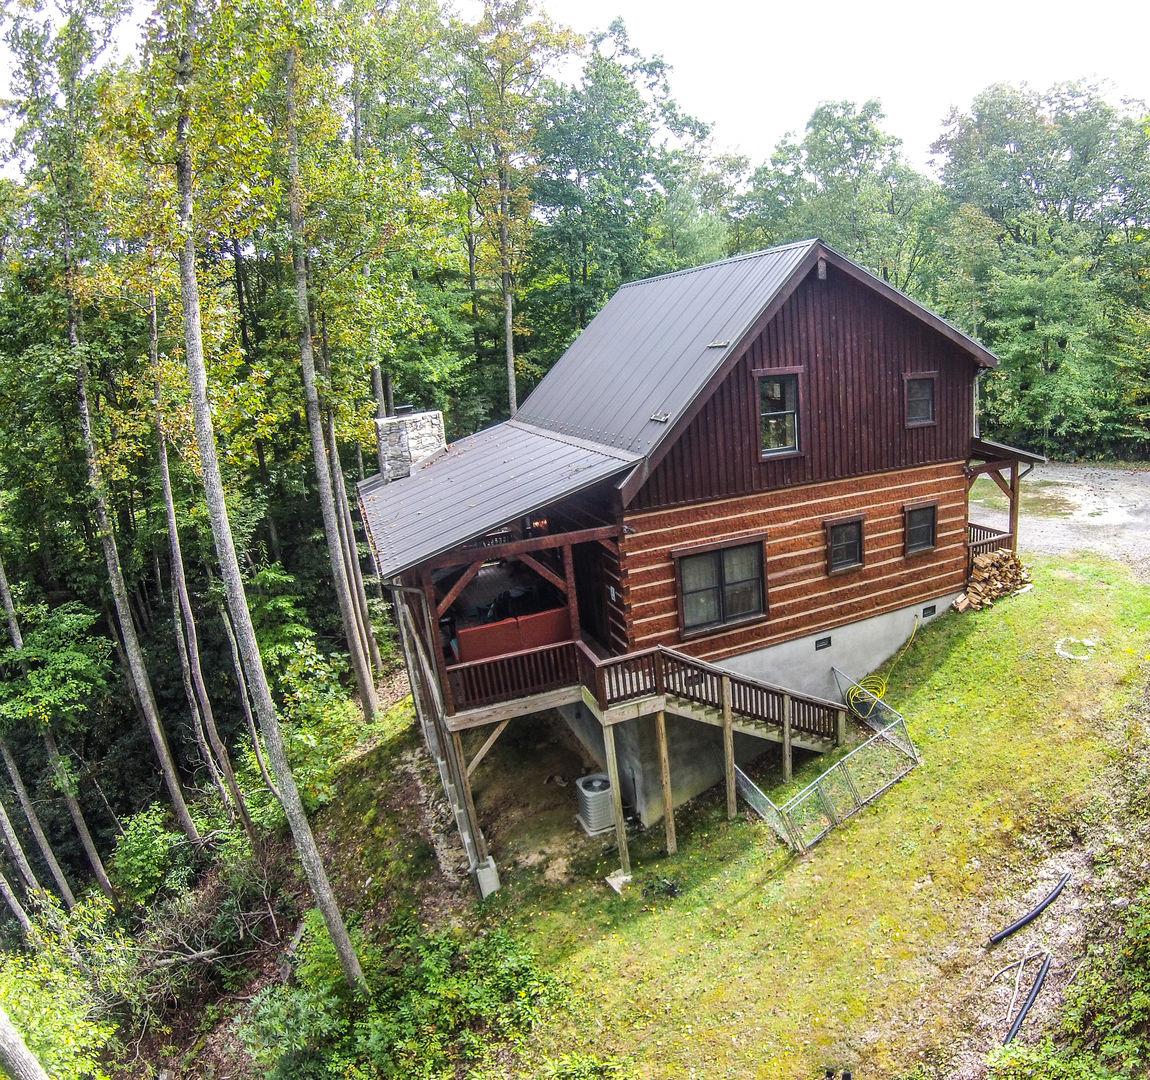 Rustic log cabin in the clouds